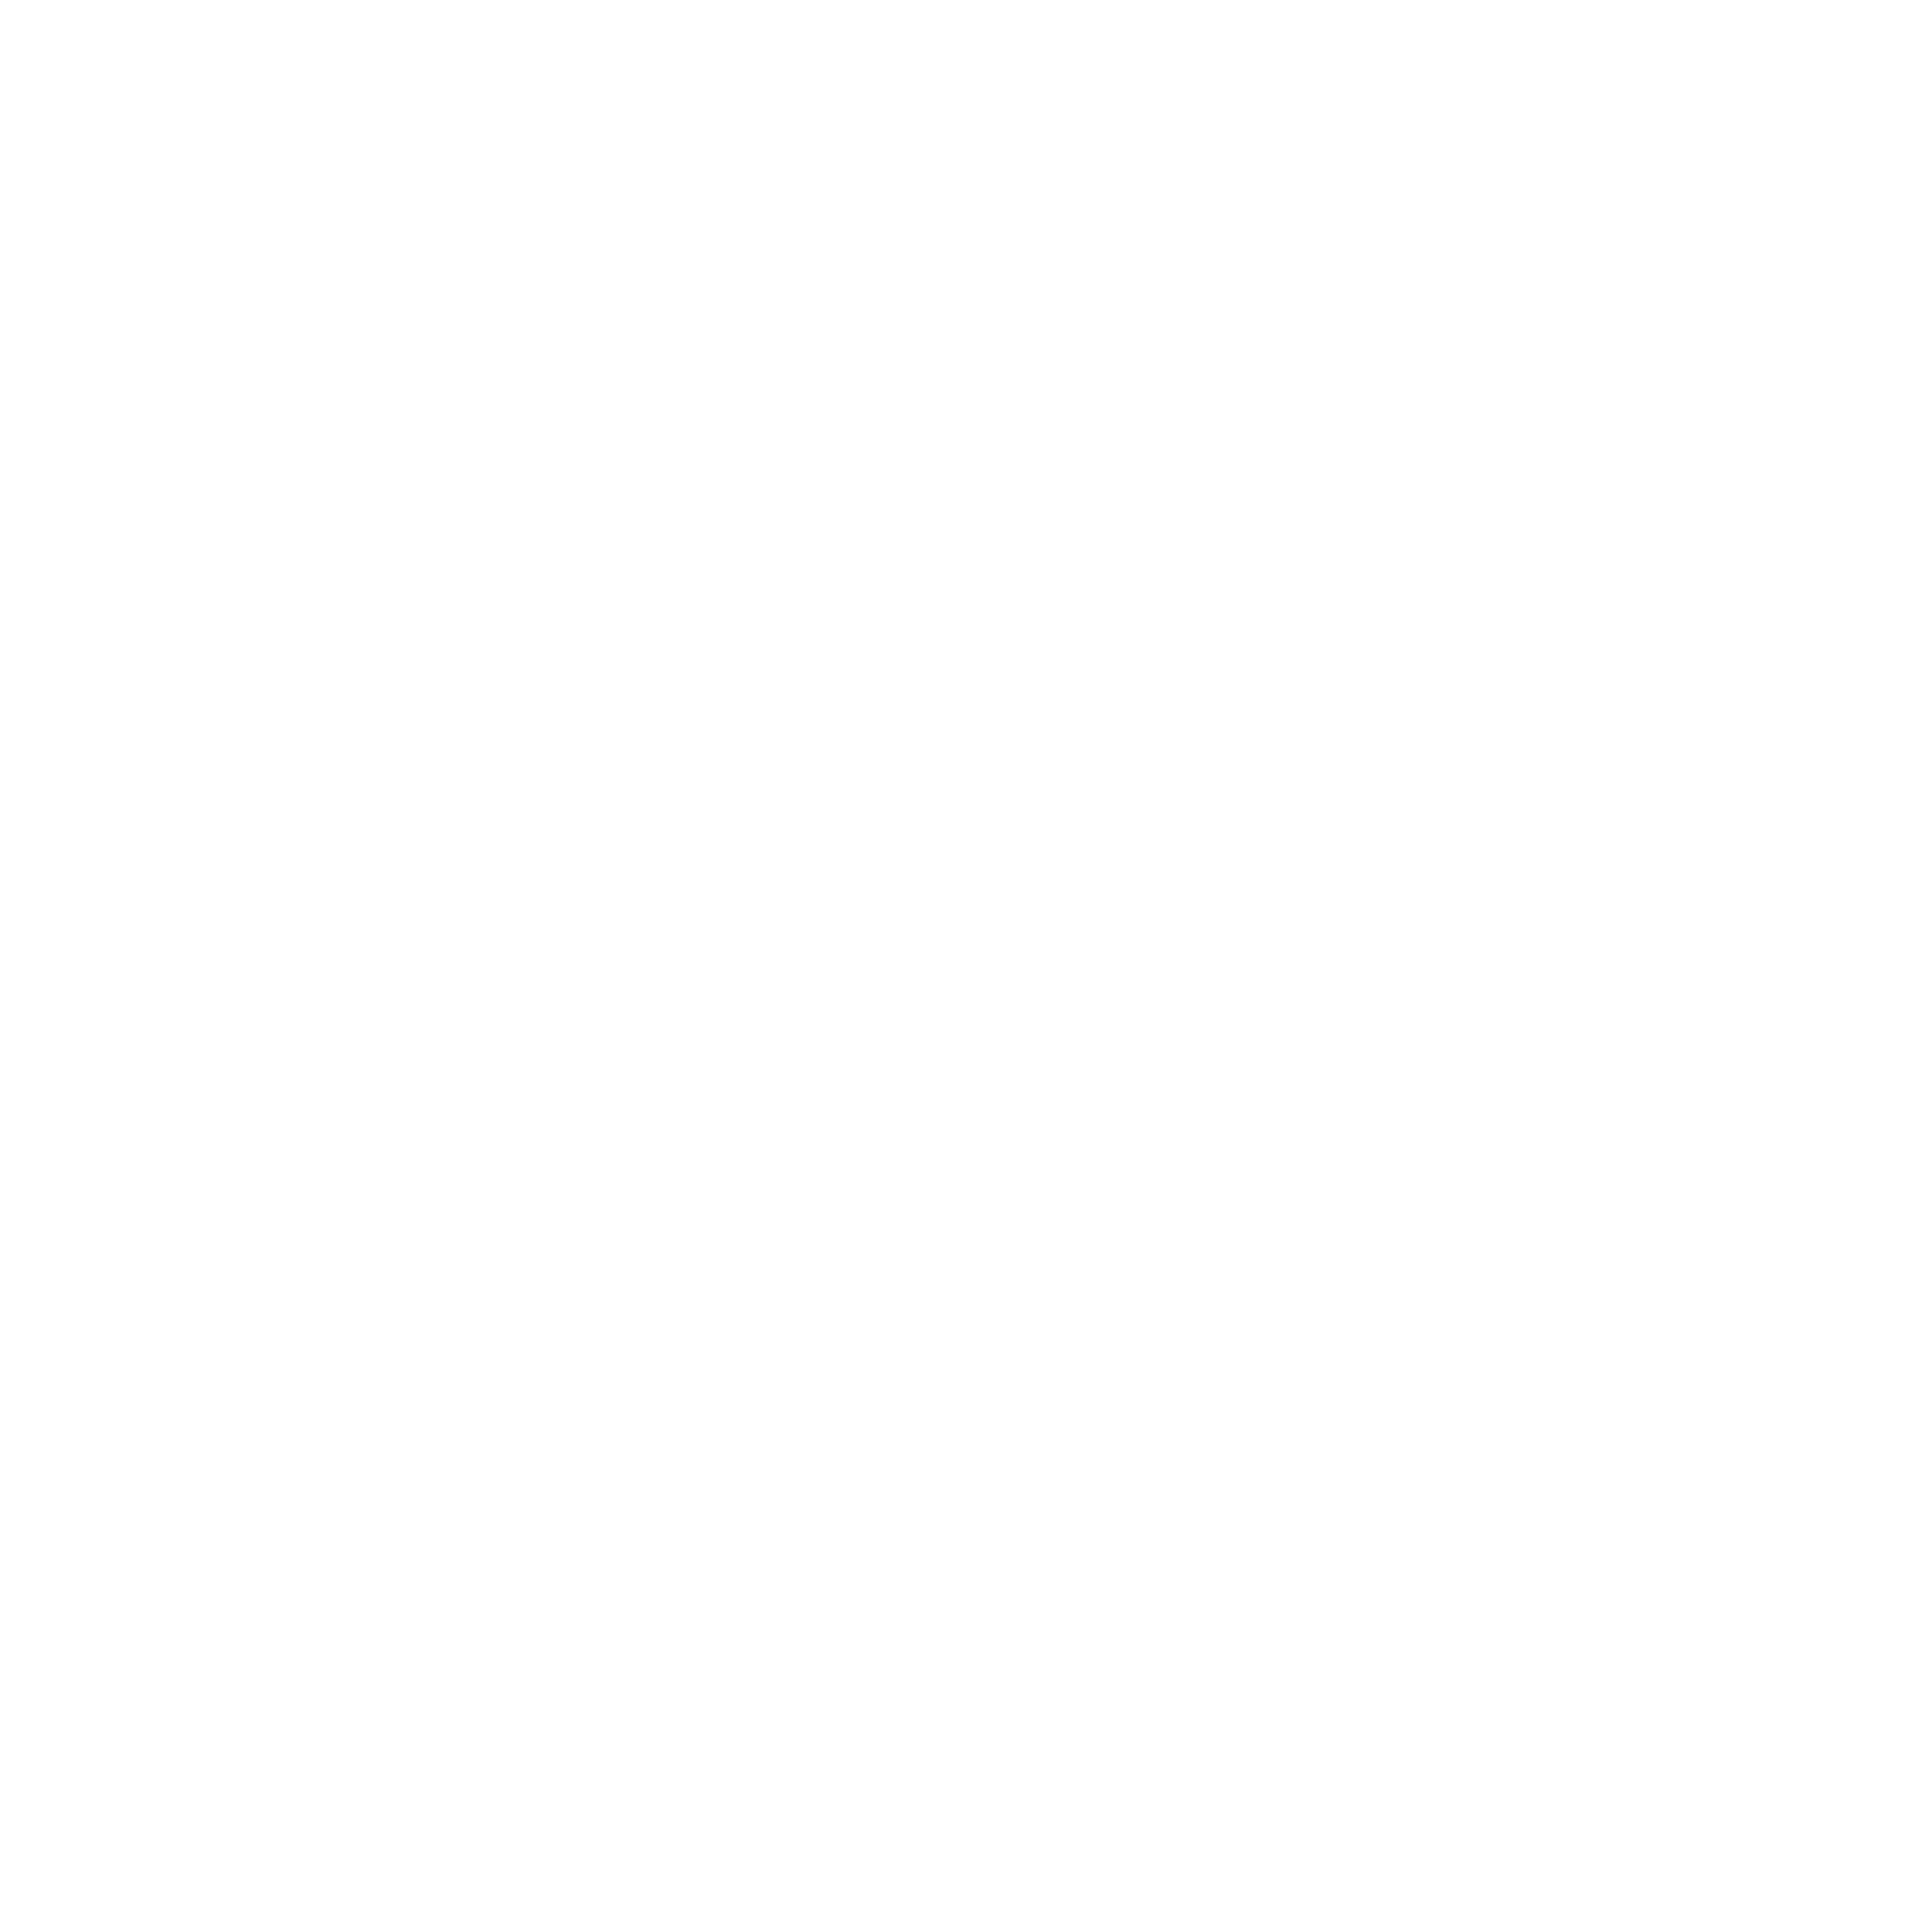 Logo Diplostudio